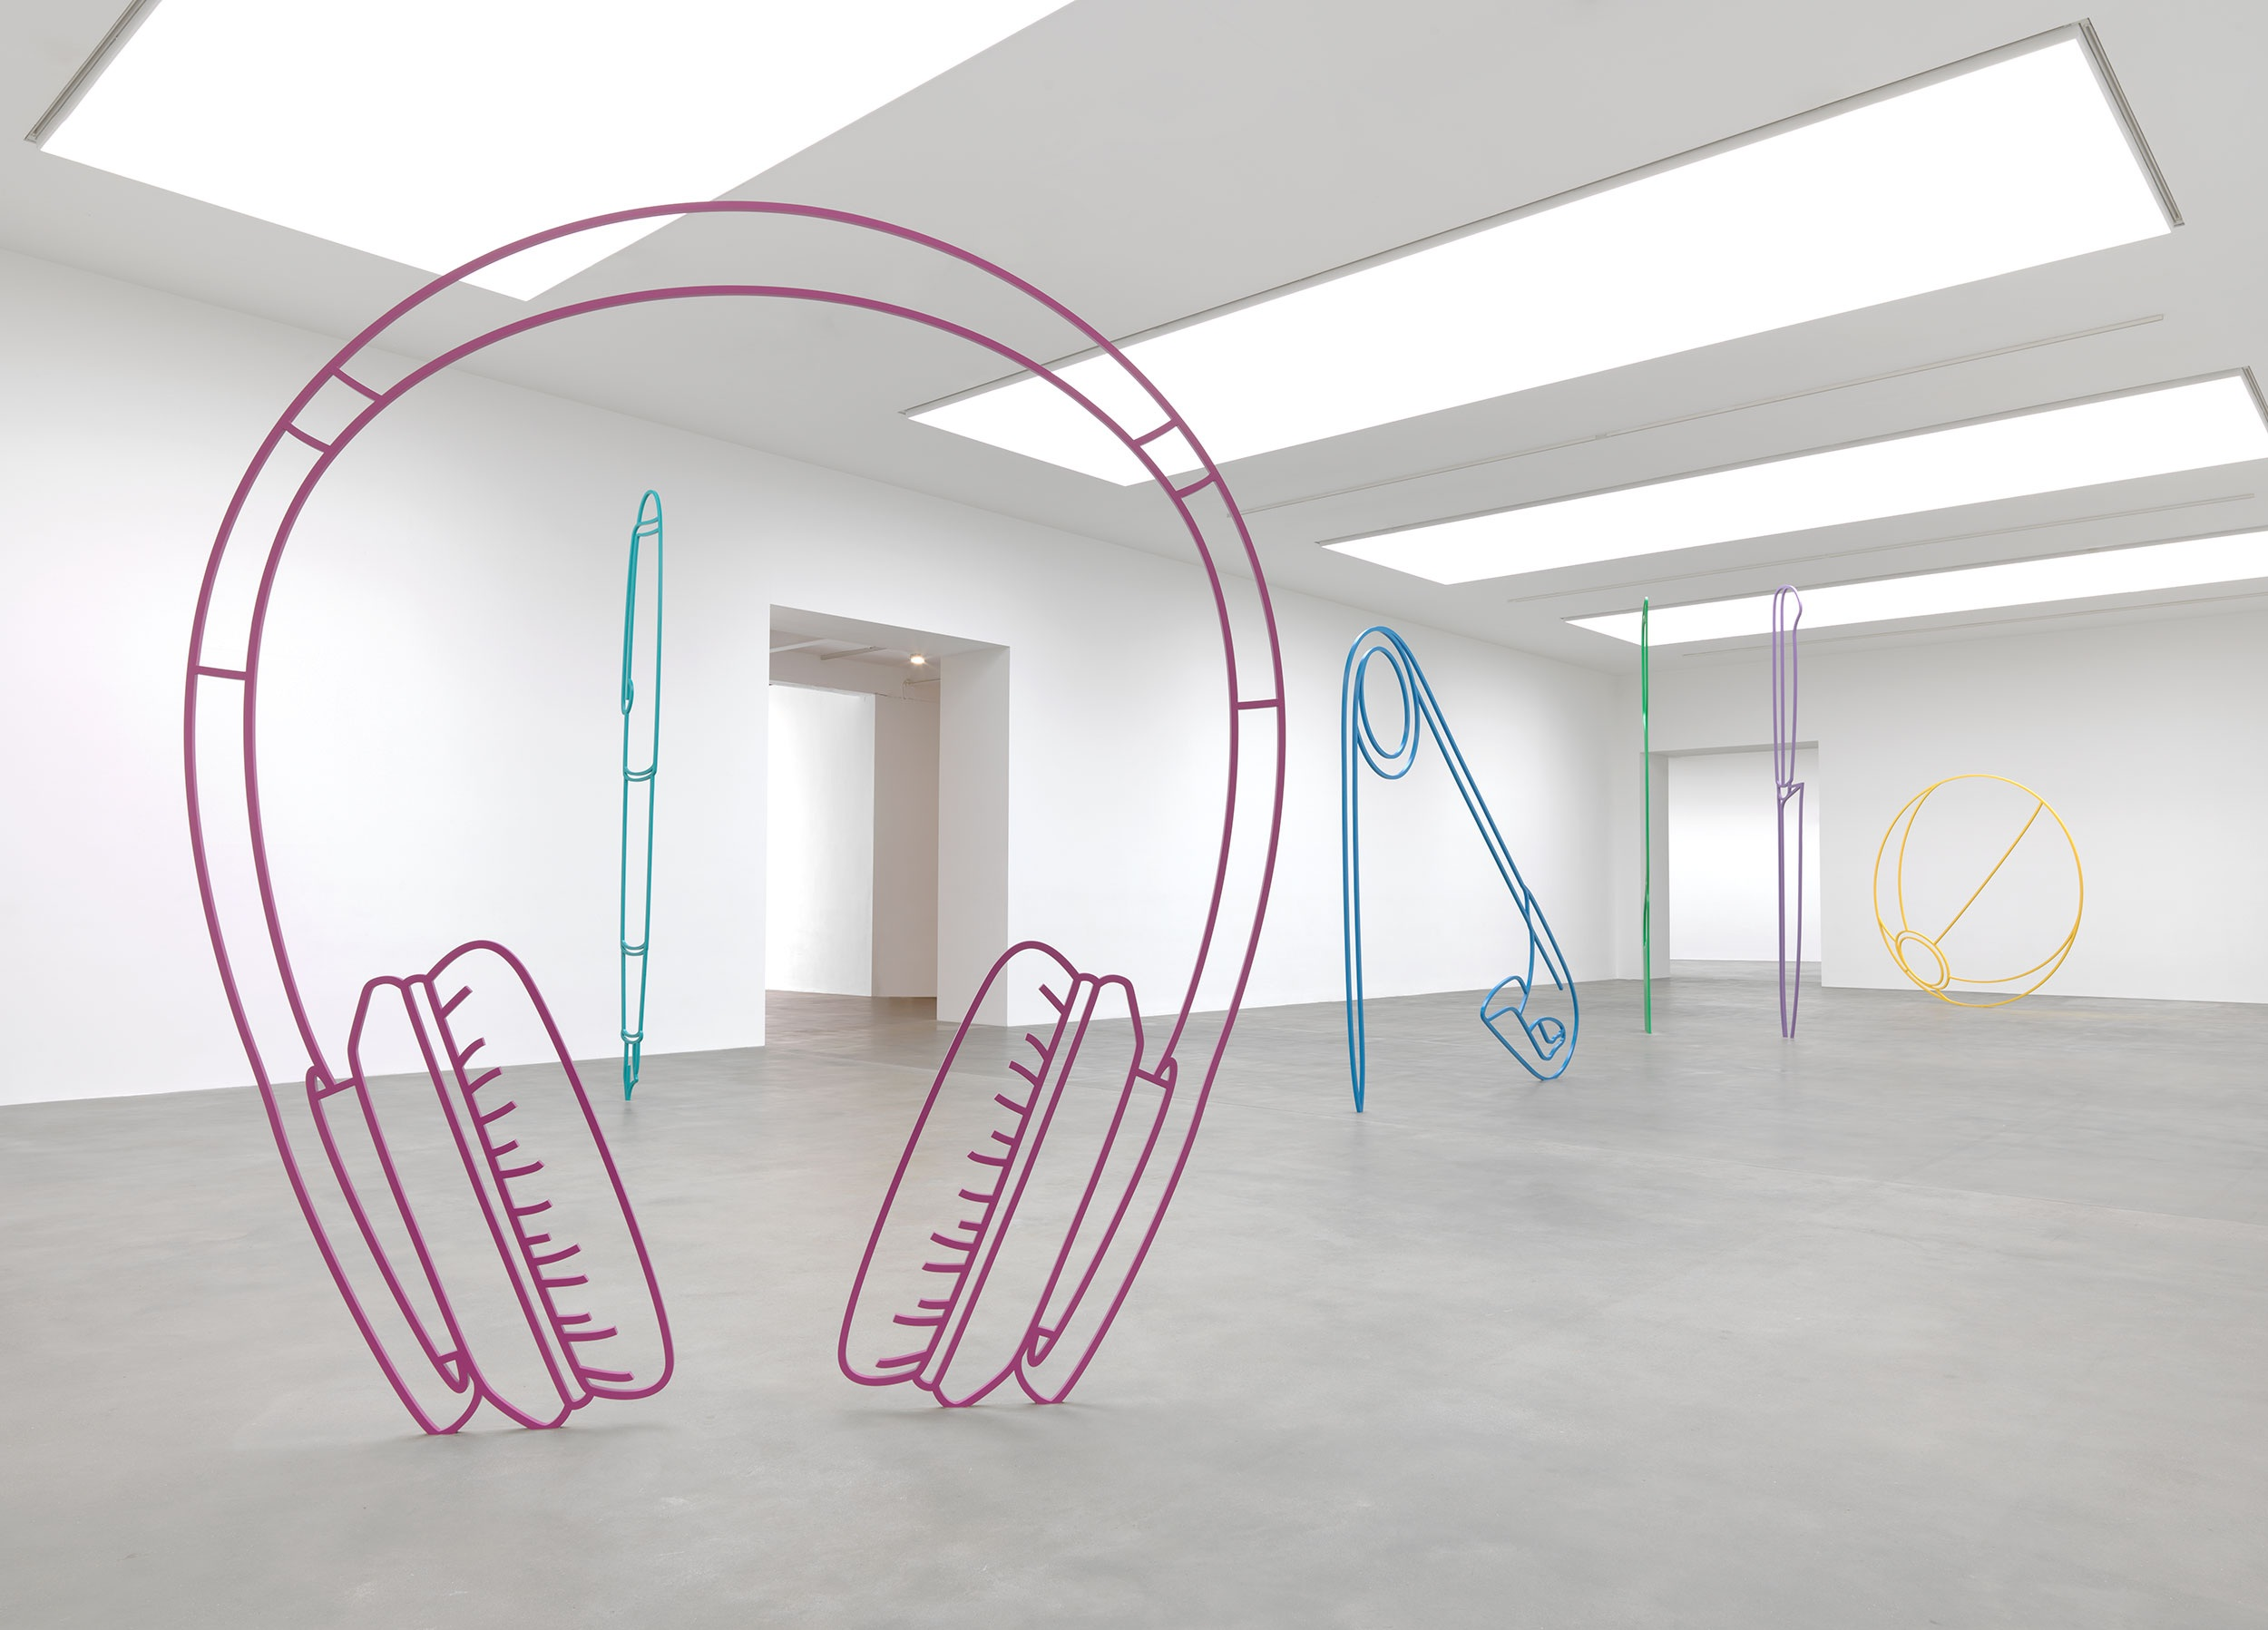 CRAIG-2019-Sculpture-Installation-view-D.jpg